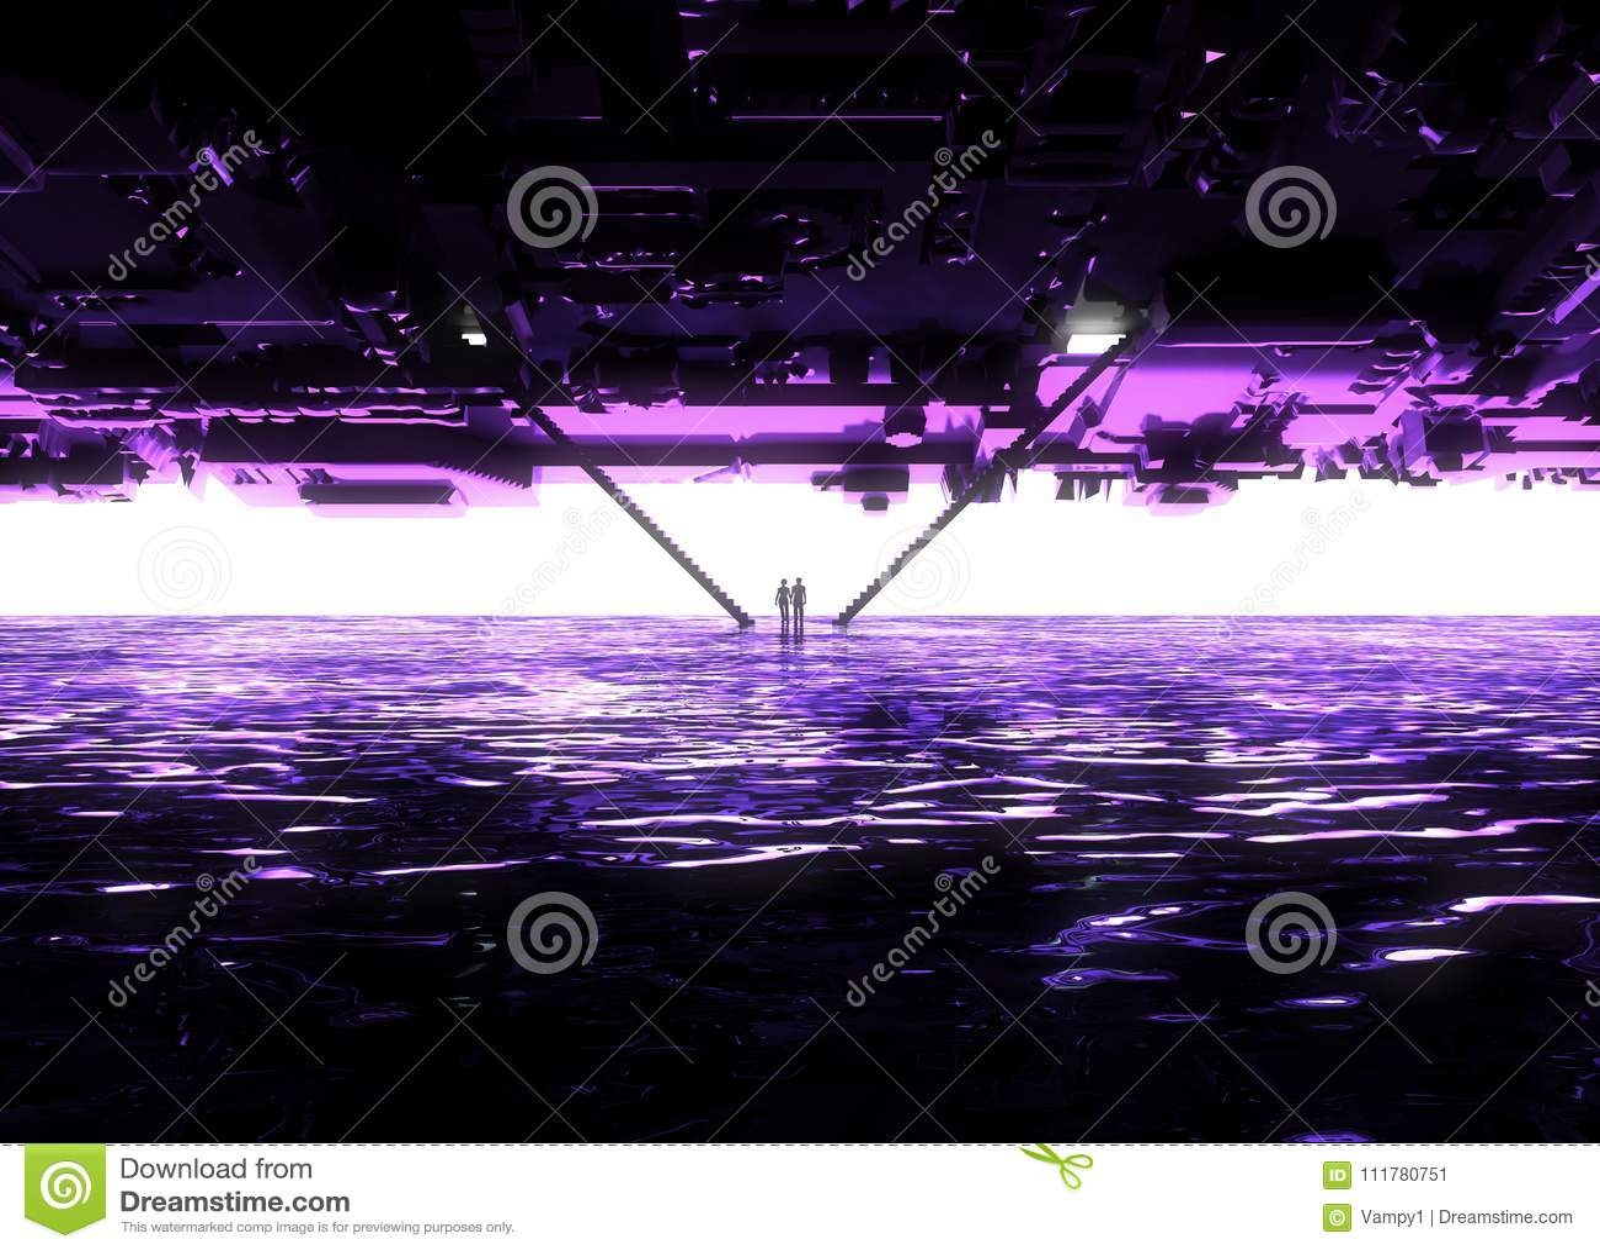 Fantasy landscape, fissure, darkness, light, sun, people in backlight in a science fiction landscape, big light portal, stairs